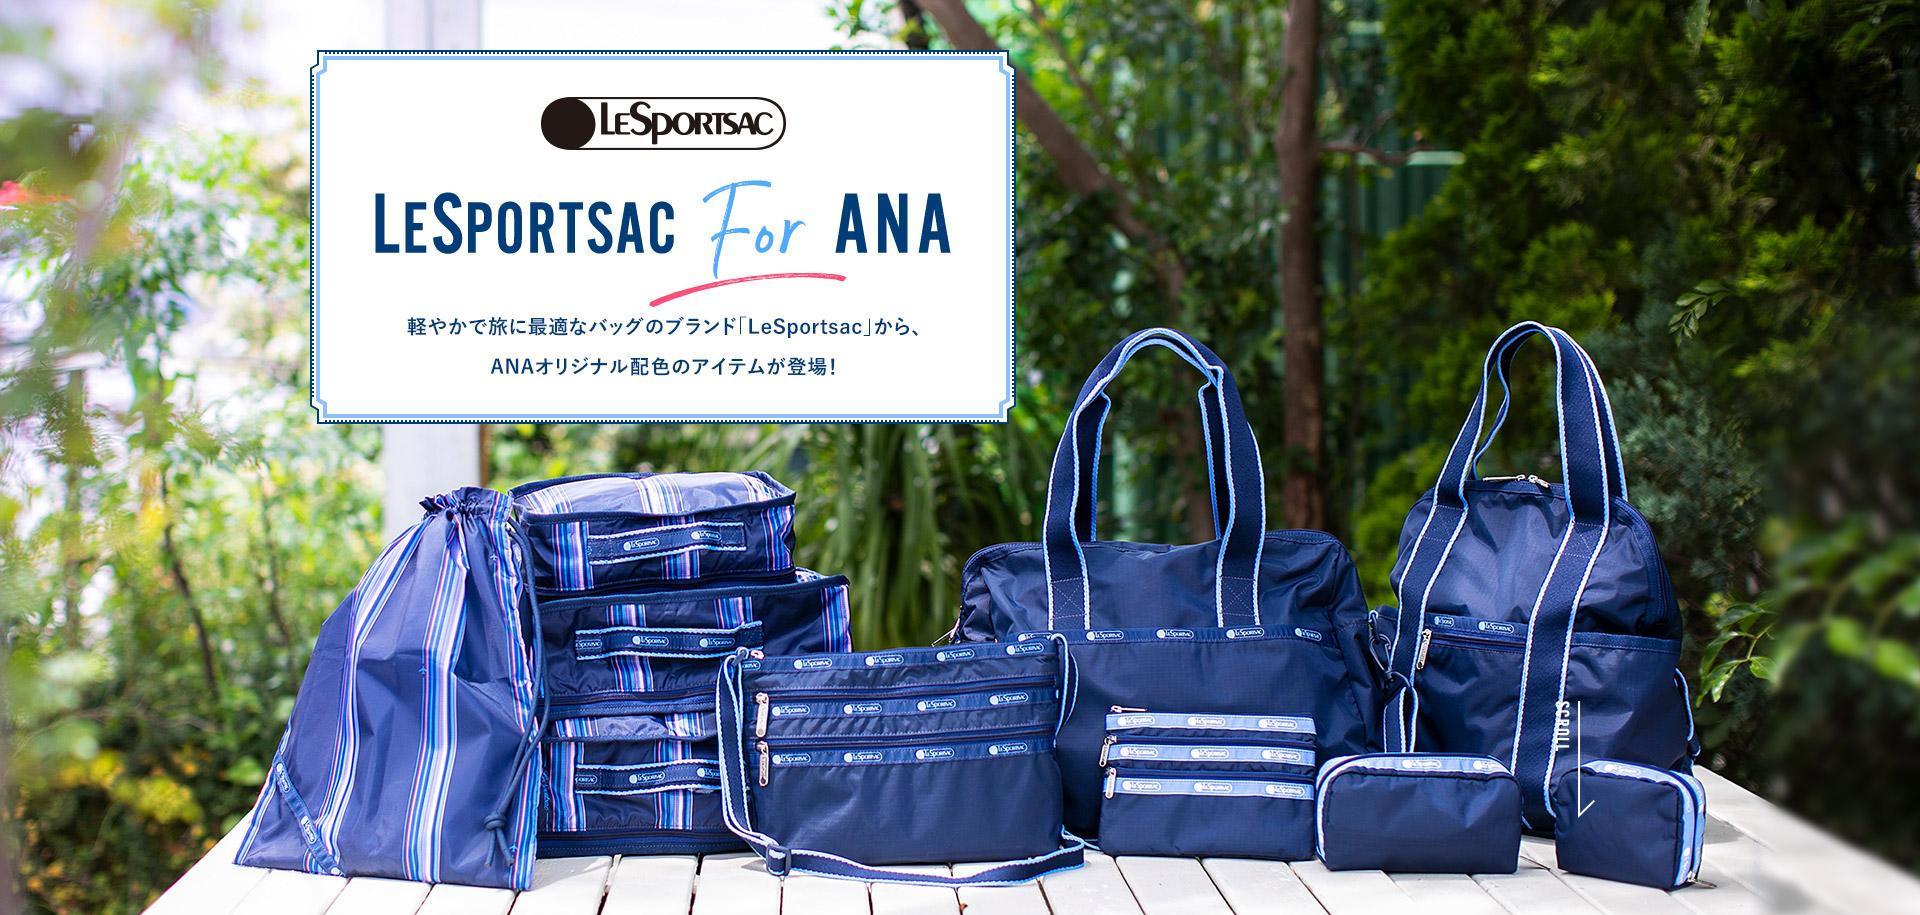 LeSportsac for ANA